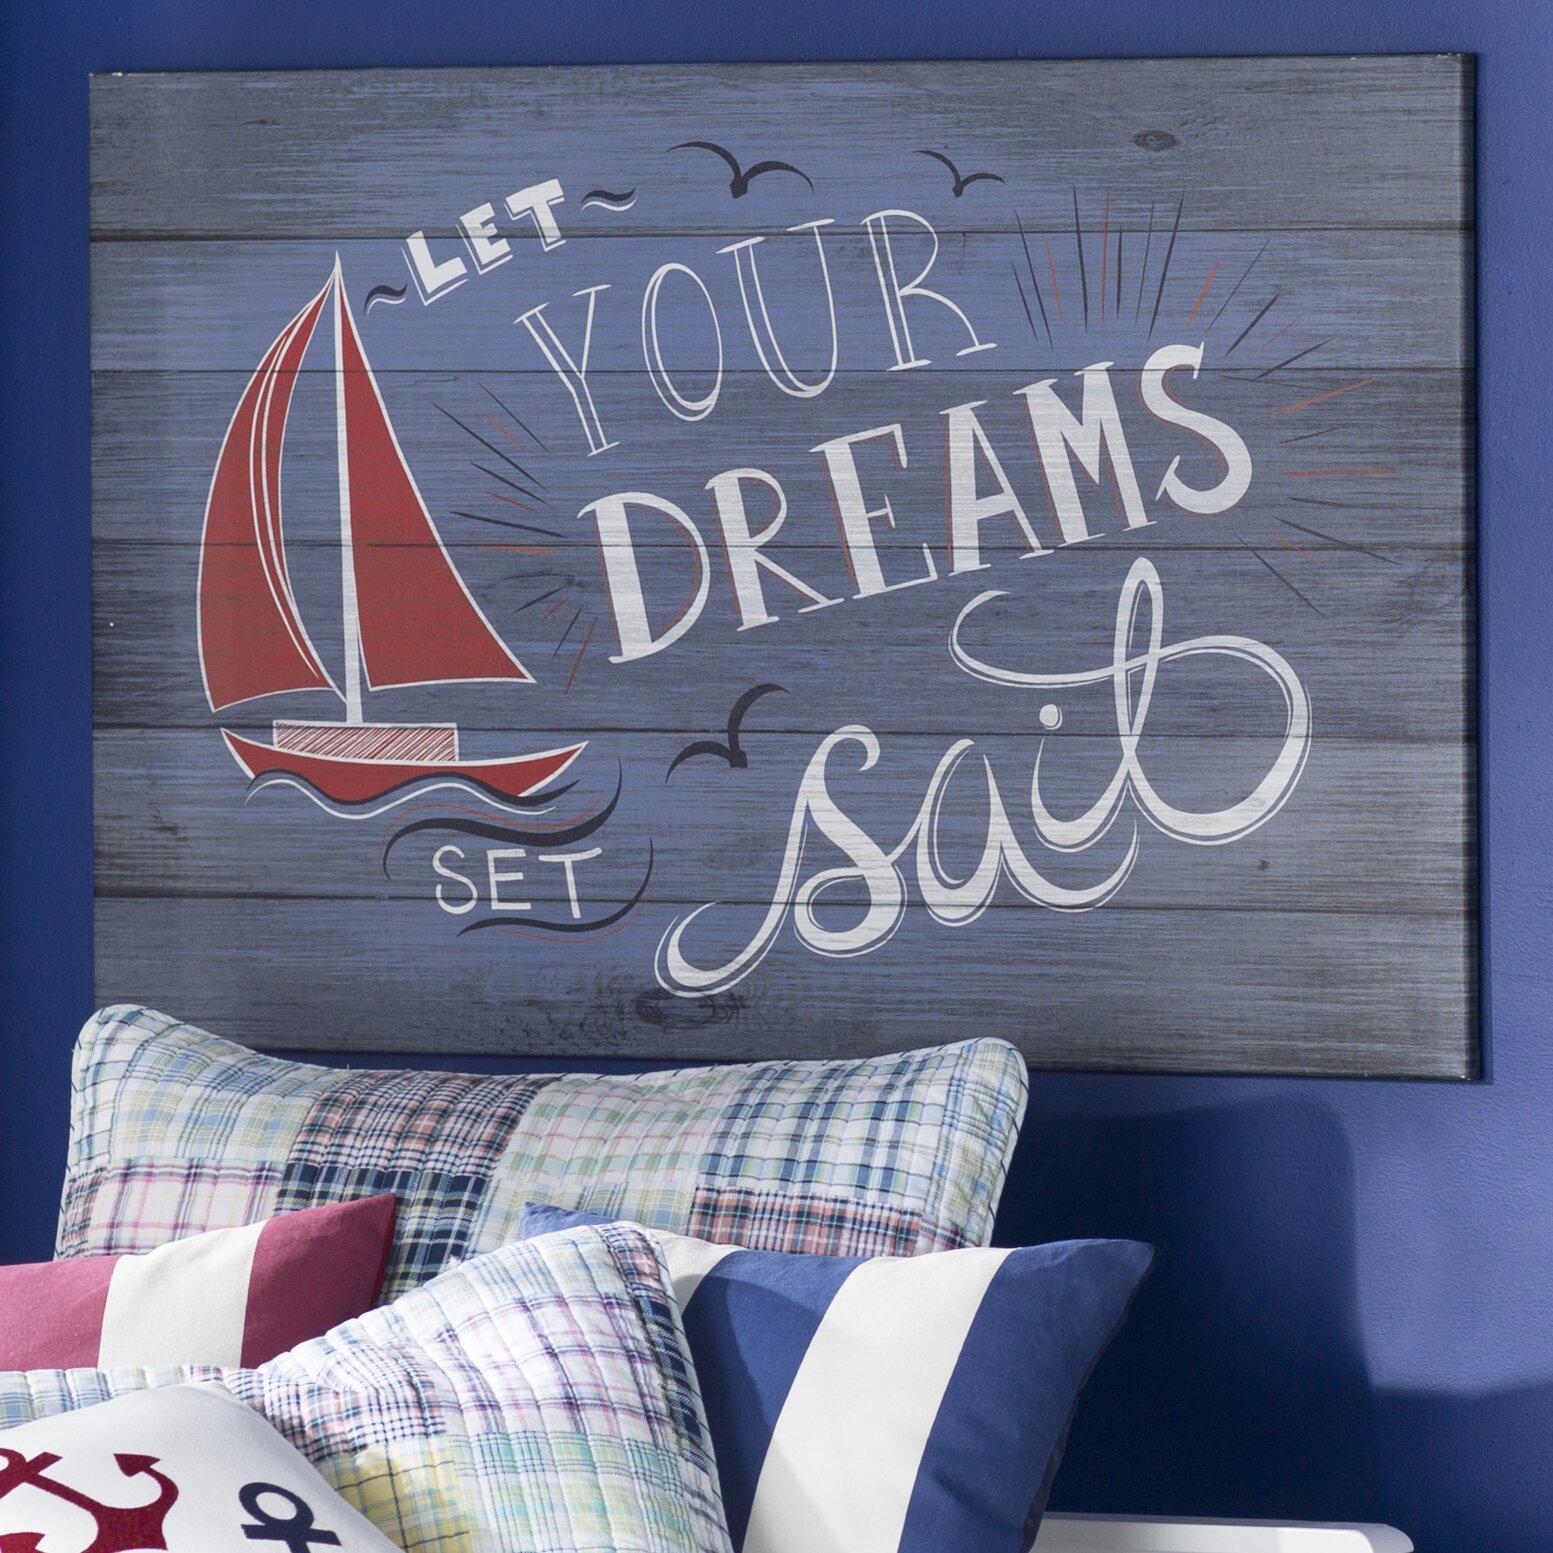 Breakwater Bay 39Let Your Dreams Set Sail39